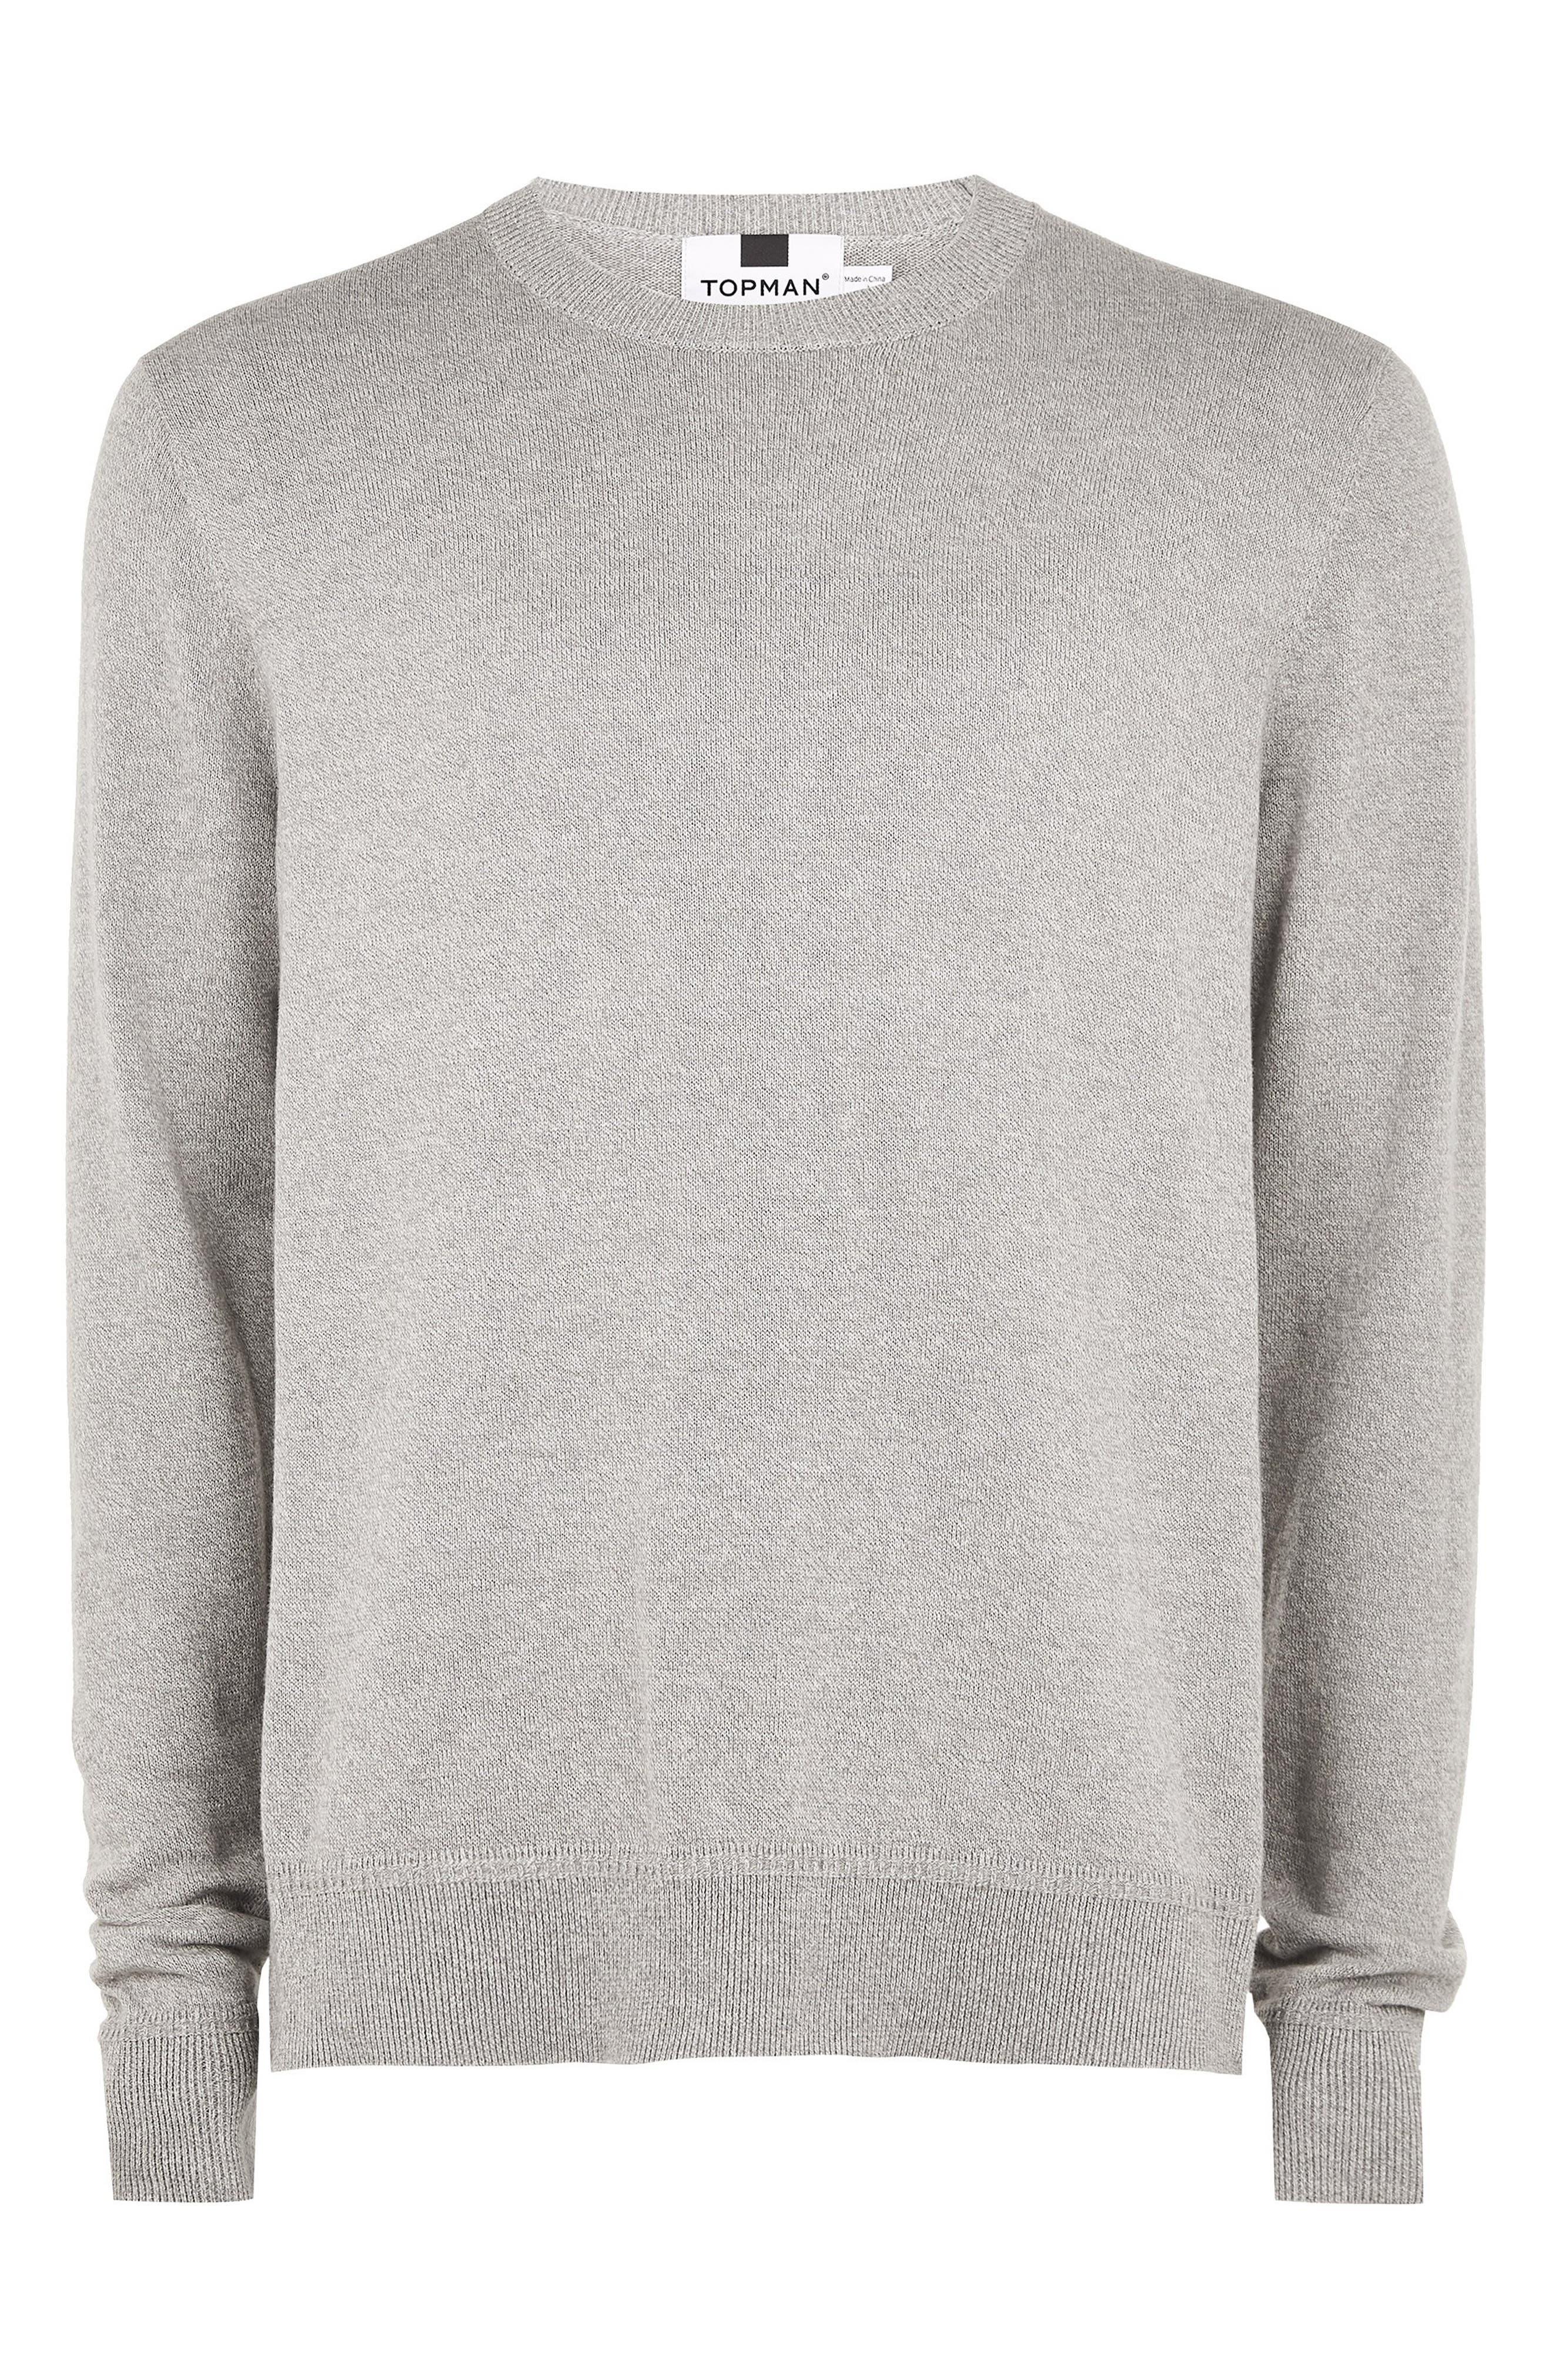 Marl Crewneck Sweater,                             Alternate thumbnail 4, color,                             CREAM